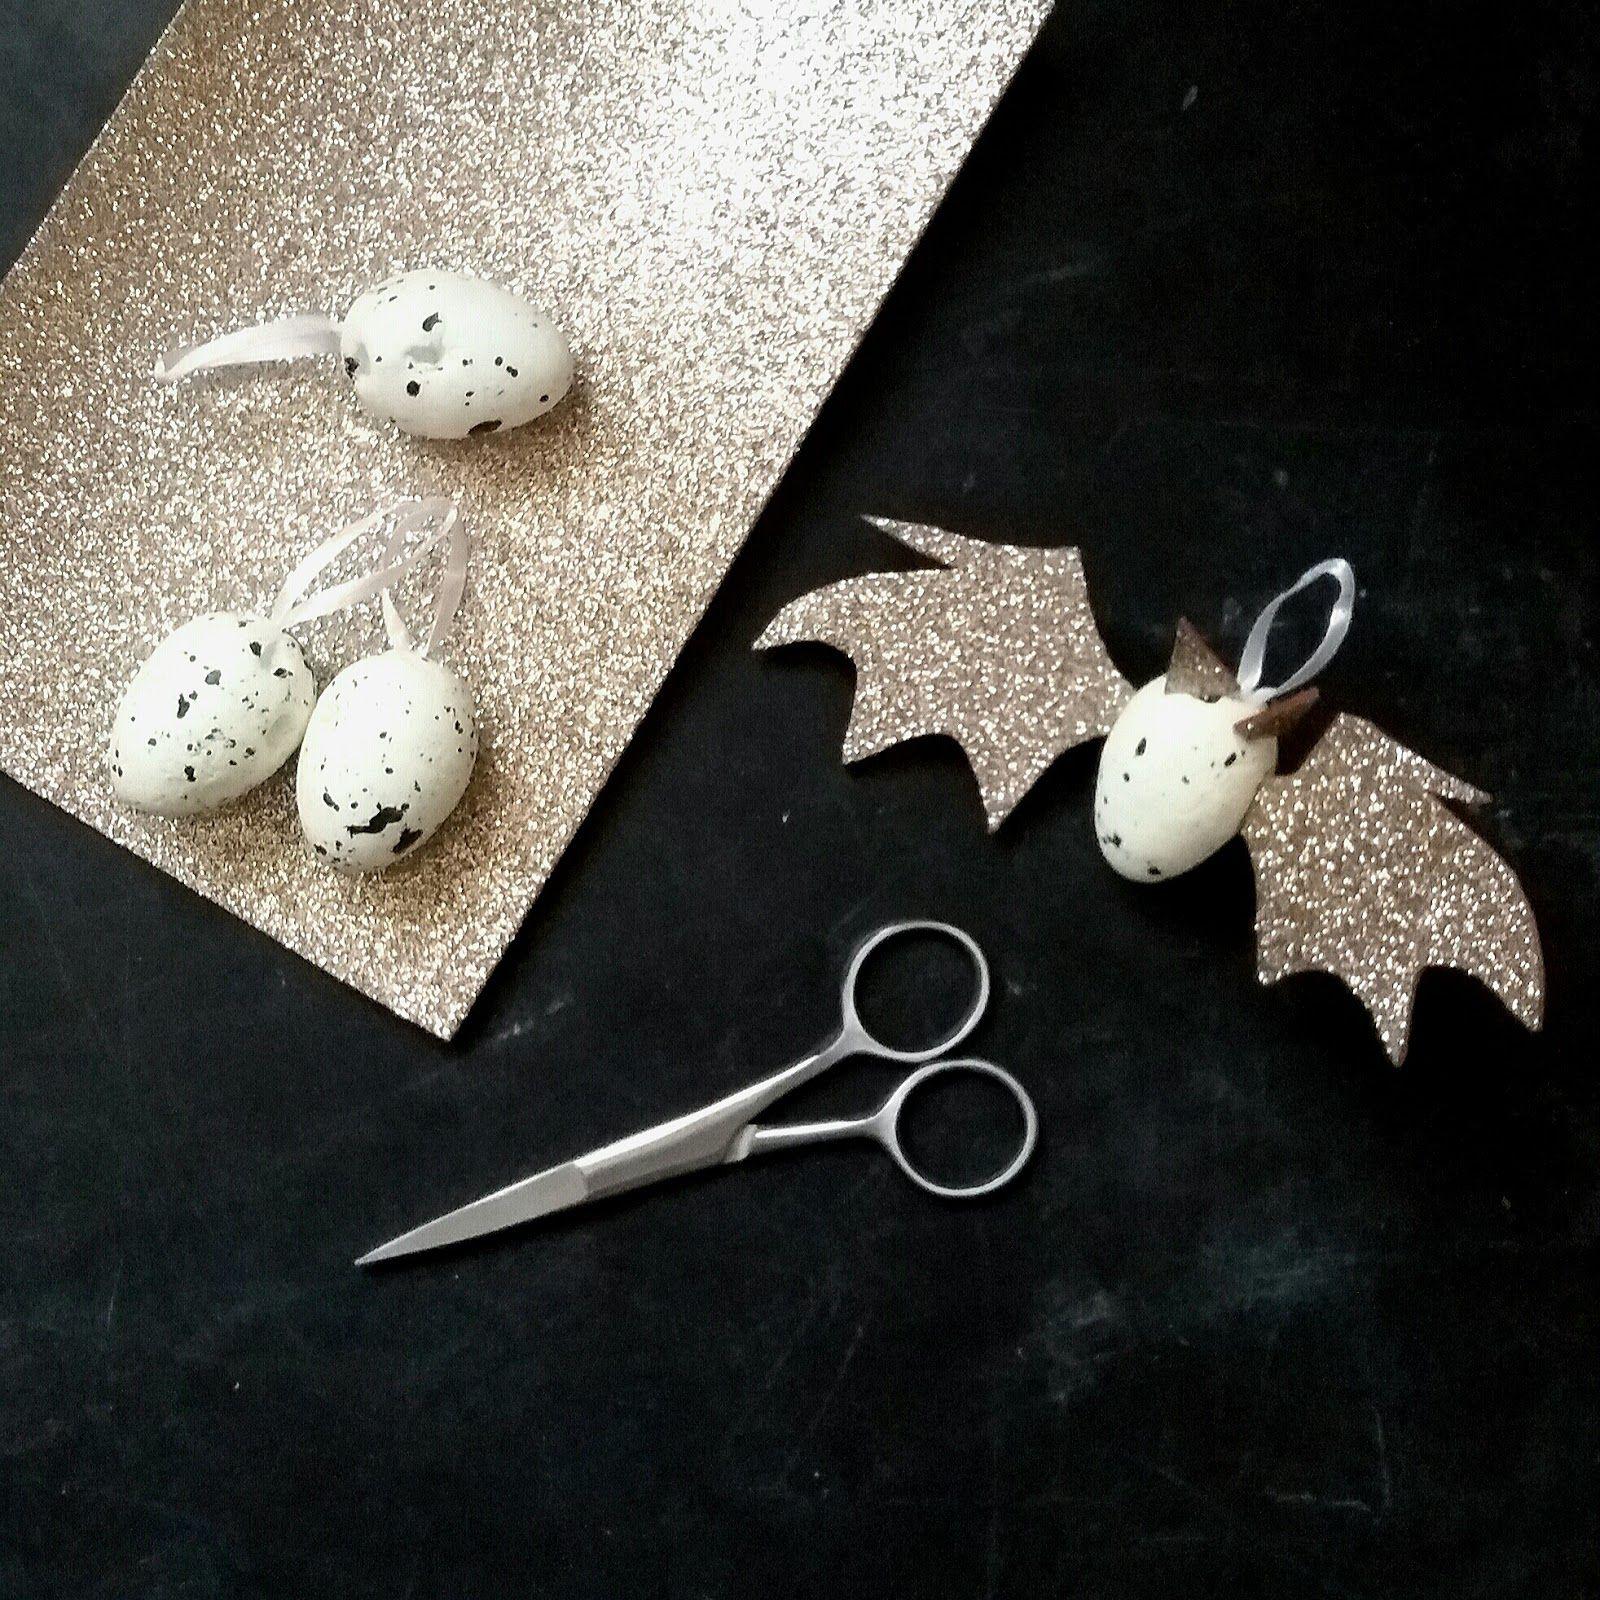 Easy Diy Halloween Bats For A Spooky Cheap Decoration